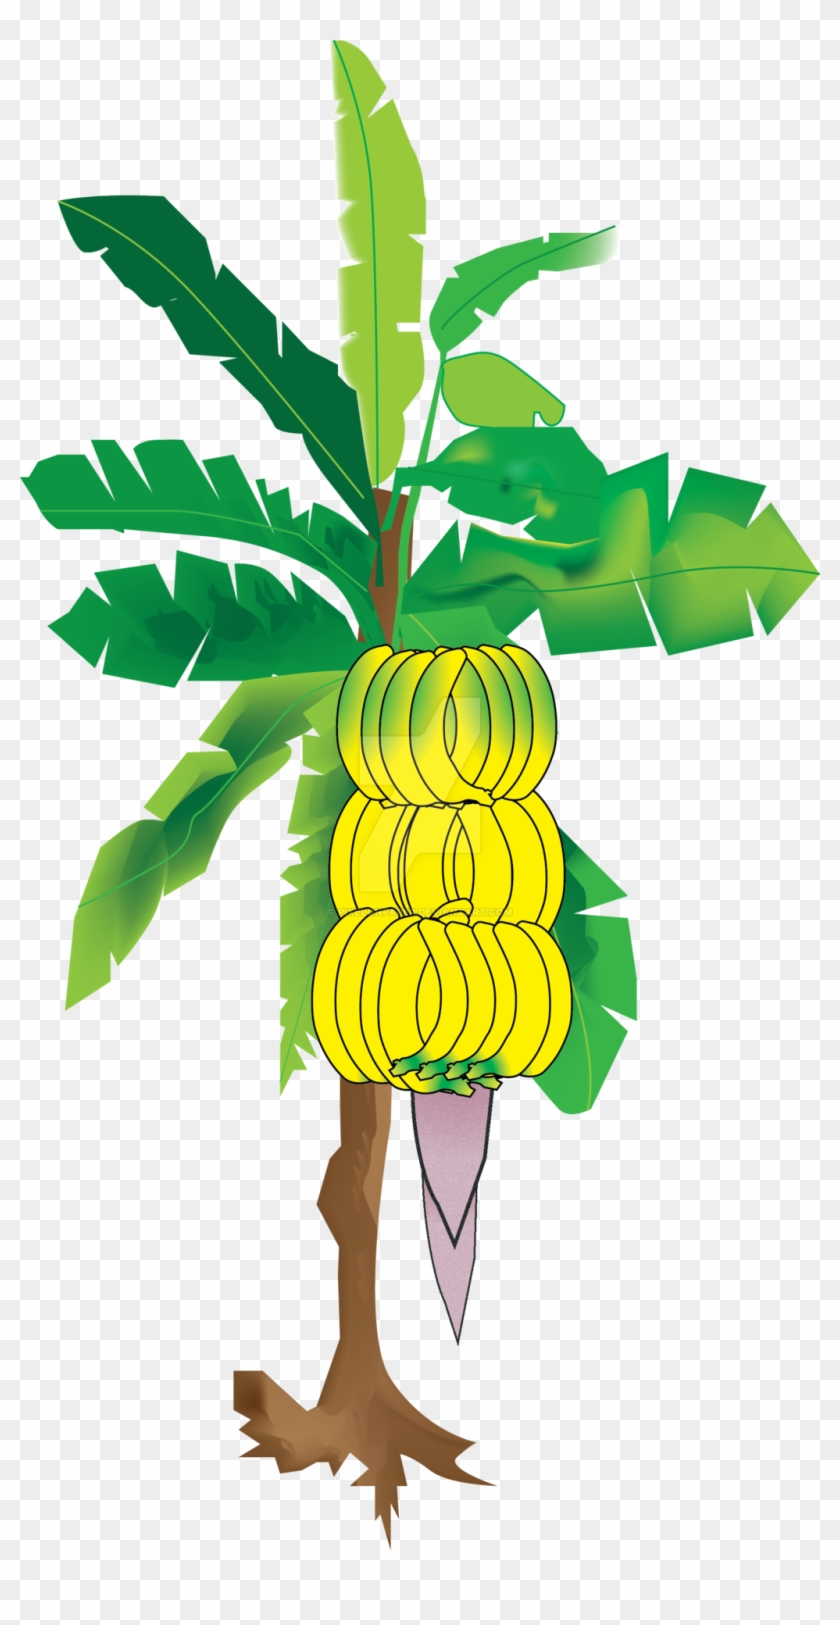 Bananatree Illuatration By Pixelonpaper - Banana Tree Hd Imajes #41746